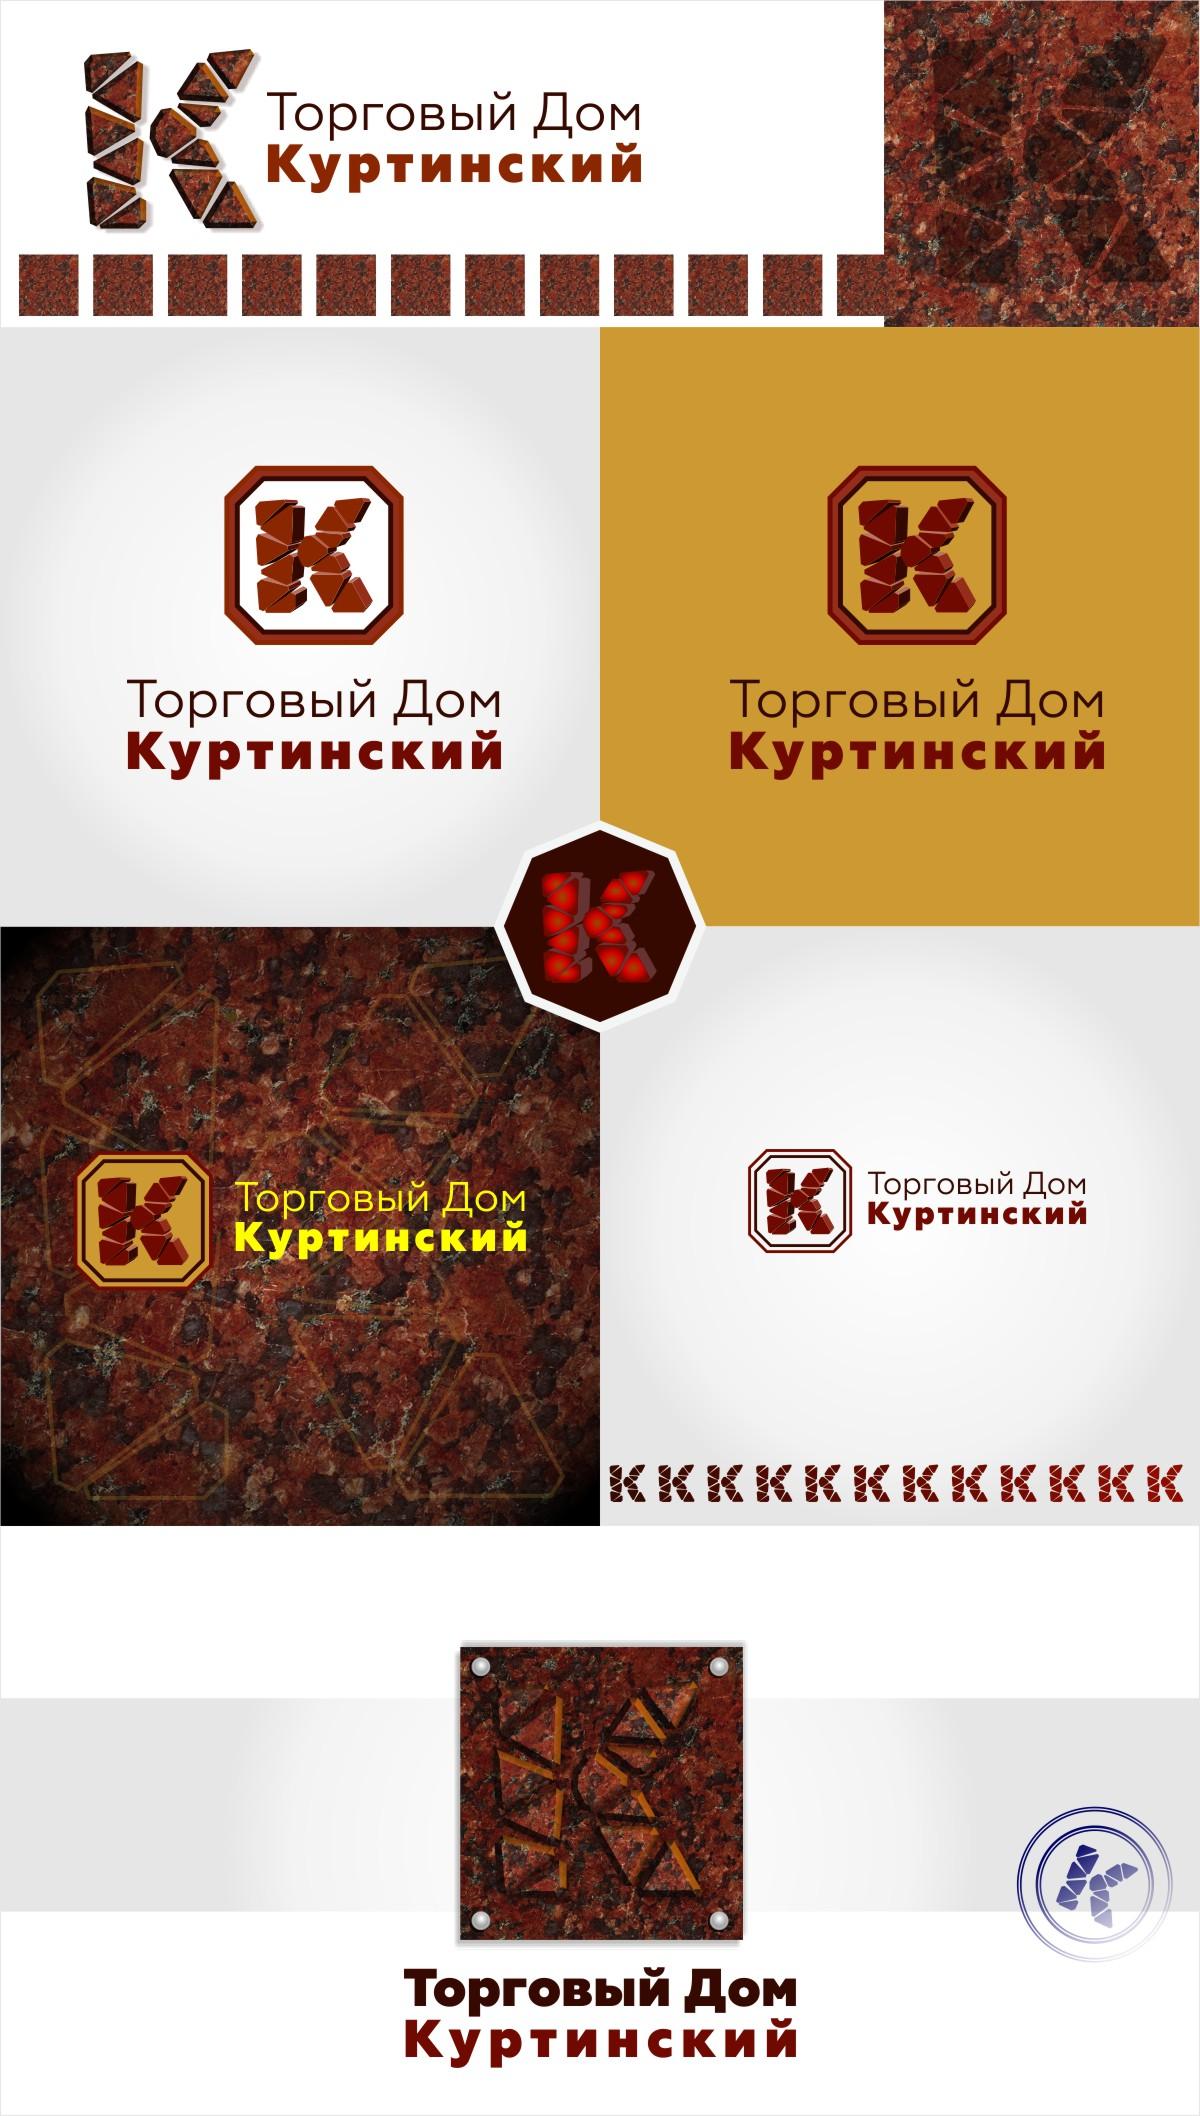 Логотип для камнедобывающей компании фото f_2115b98d8d561fe0.jpg